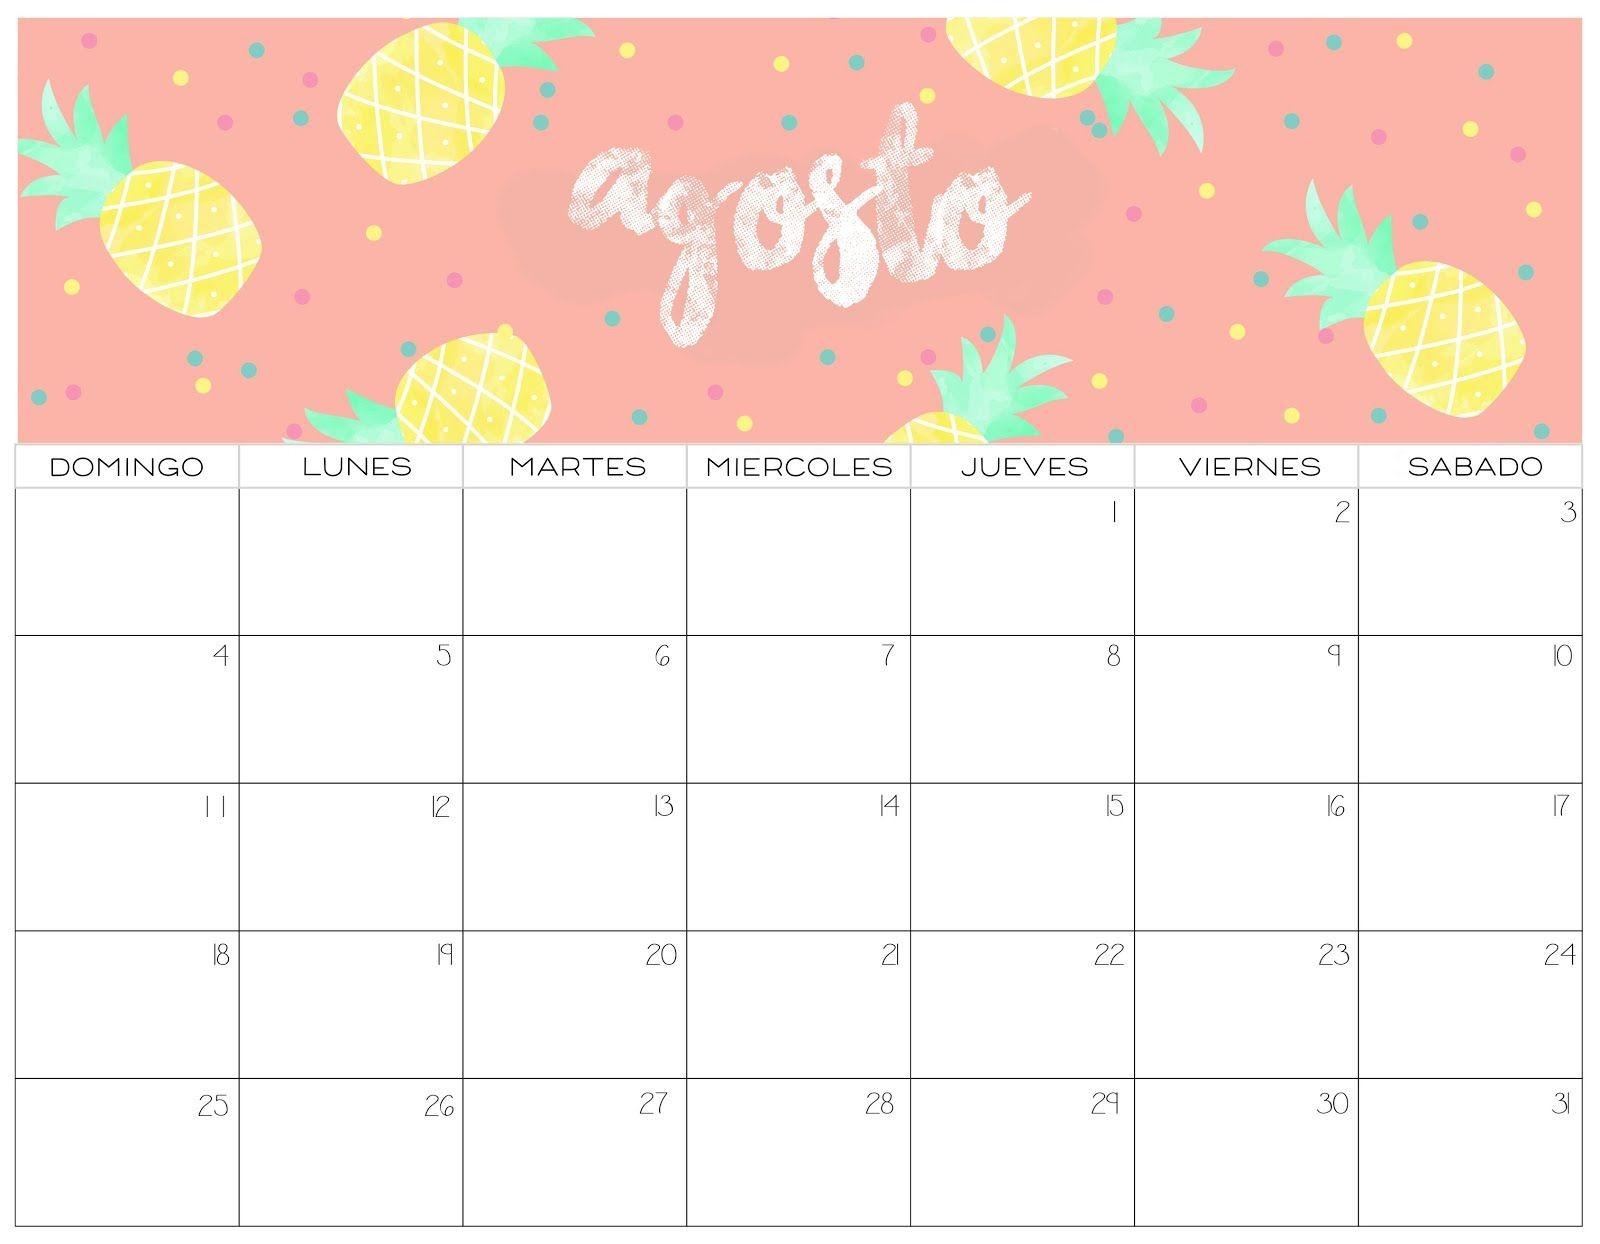 Calendario Octubre 2017 A Febrero 2018 Más Recientes Calendario 2019 Colorido 2 Estilos Meses Pinterest Of Calendario Octubre 2017 A Febrero 2018 Más Populares Calendario Para Imprimir 2019 Enero Calendario Imprimir Enero